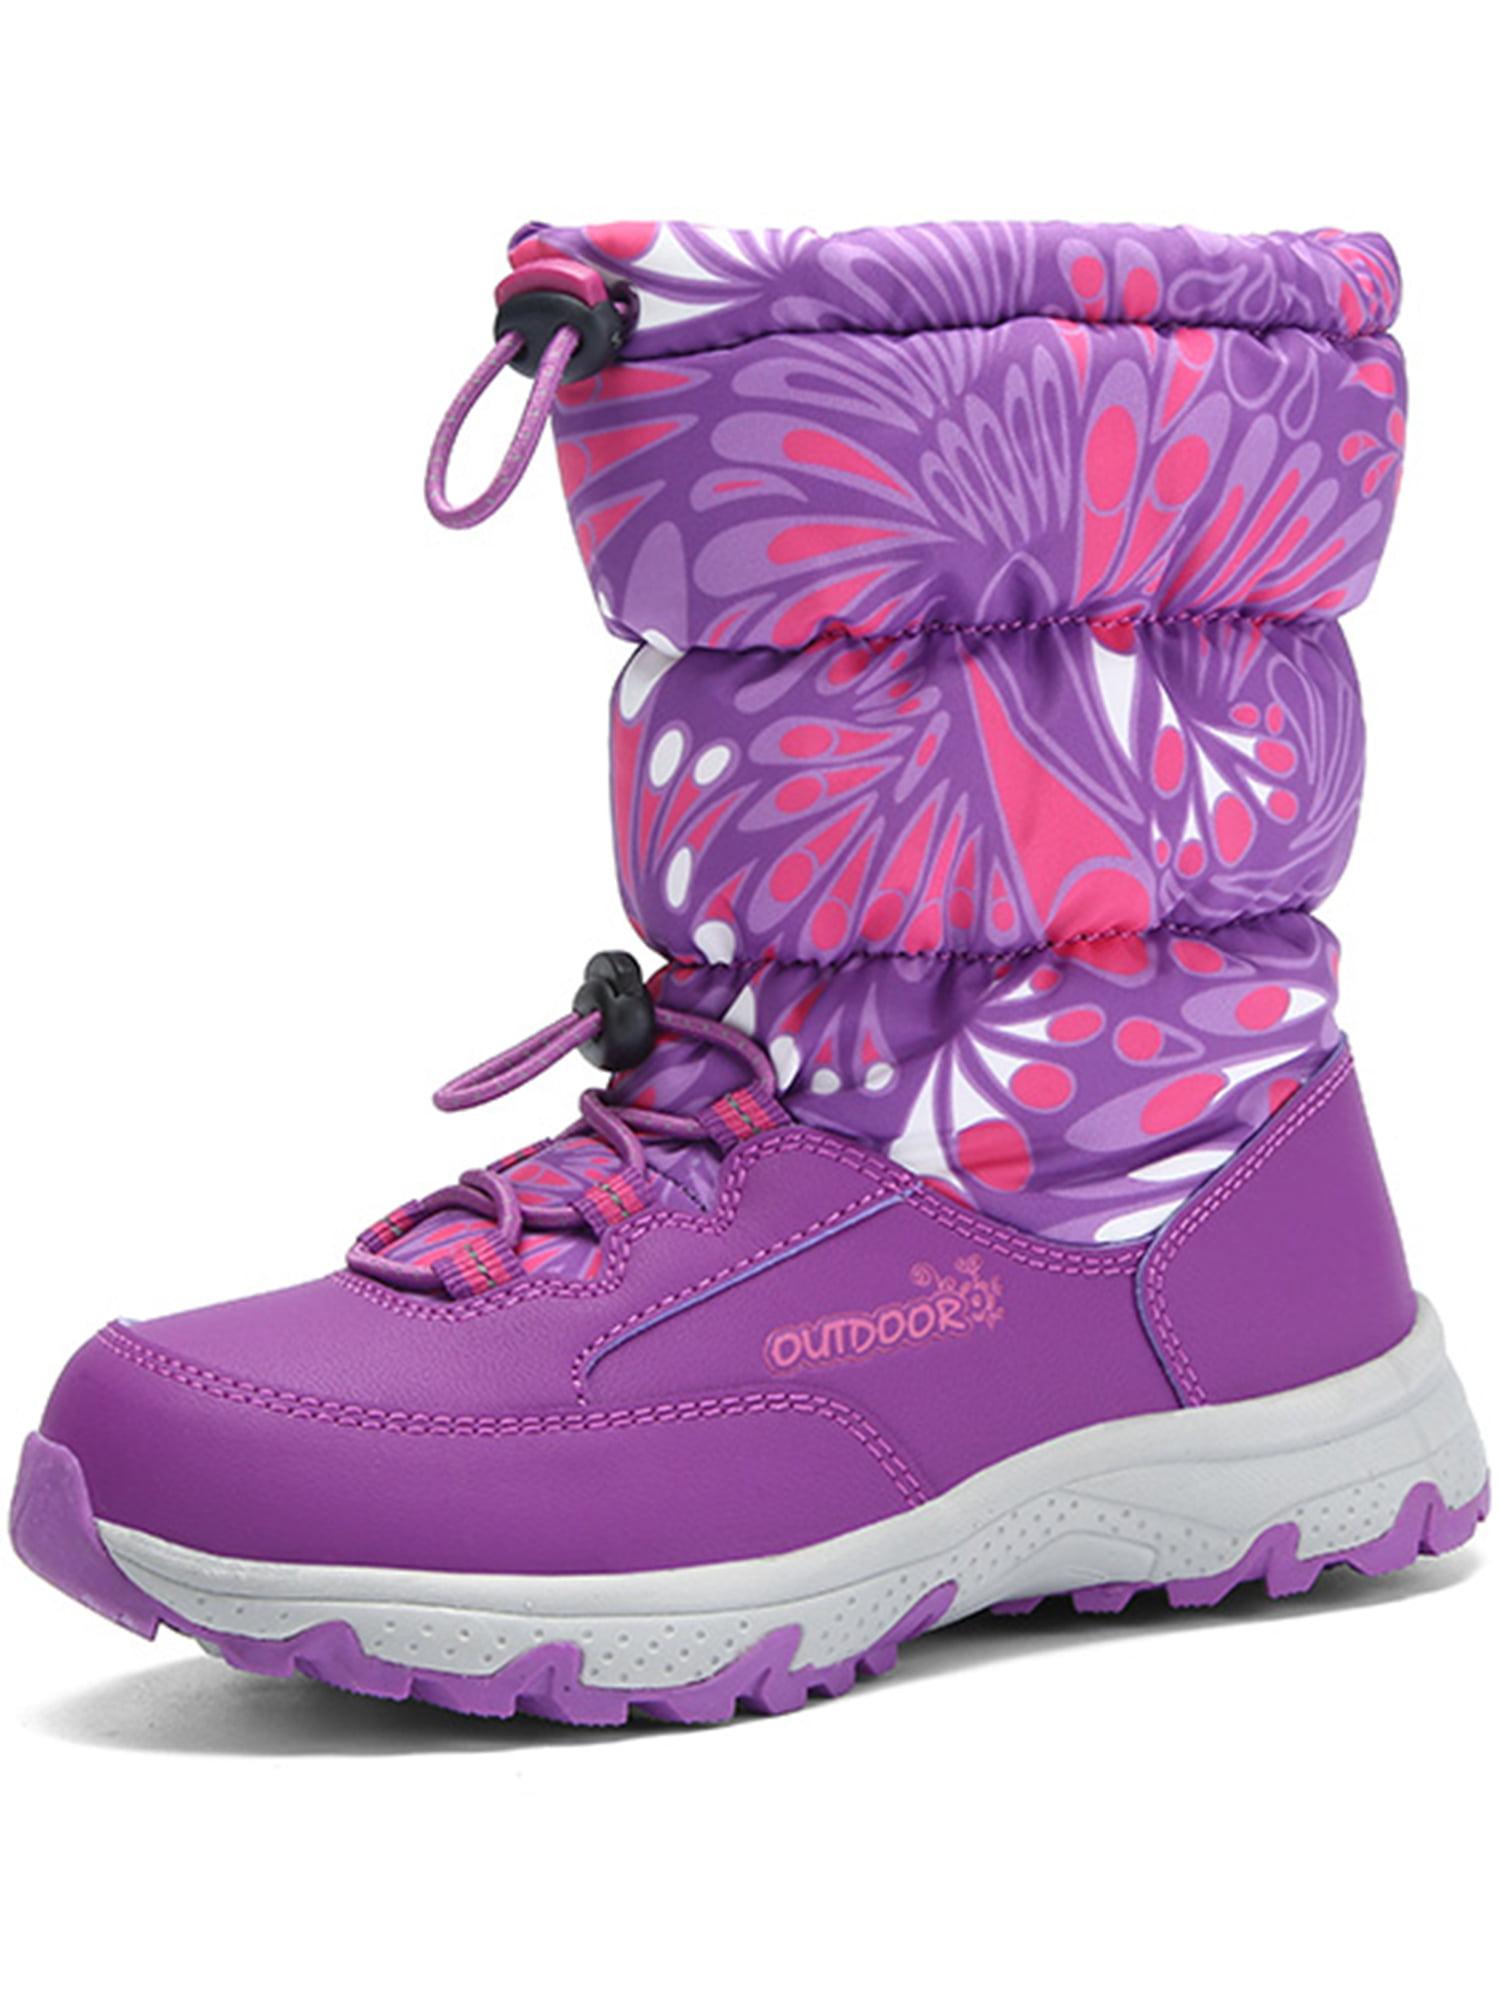 8DD3 Traction Walking on Snow Anti-Slip Winter Outdoor Winter Walking